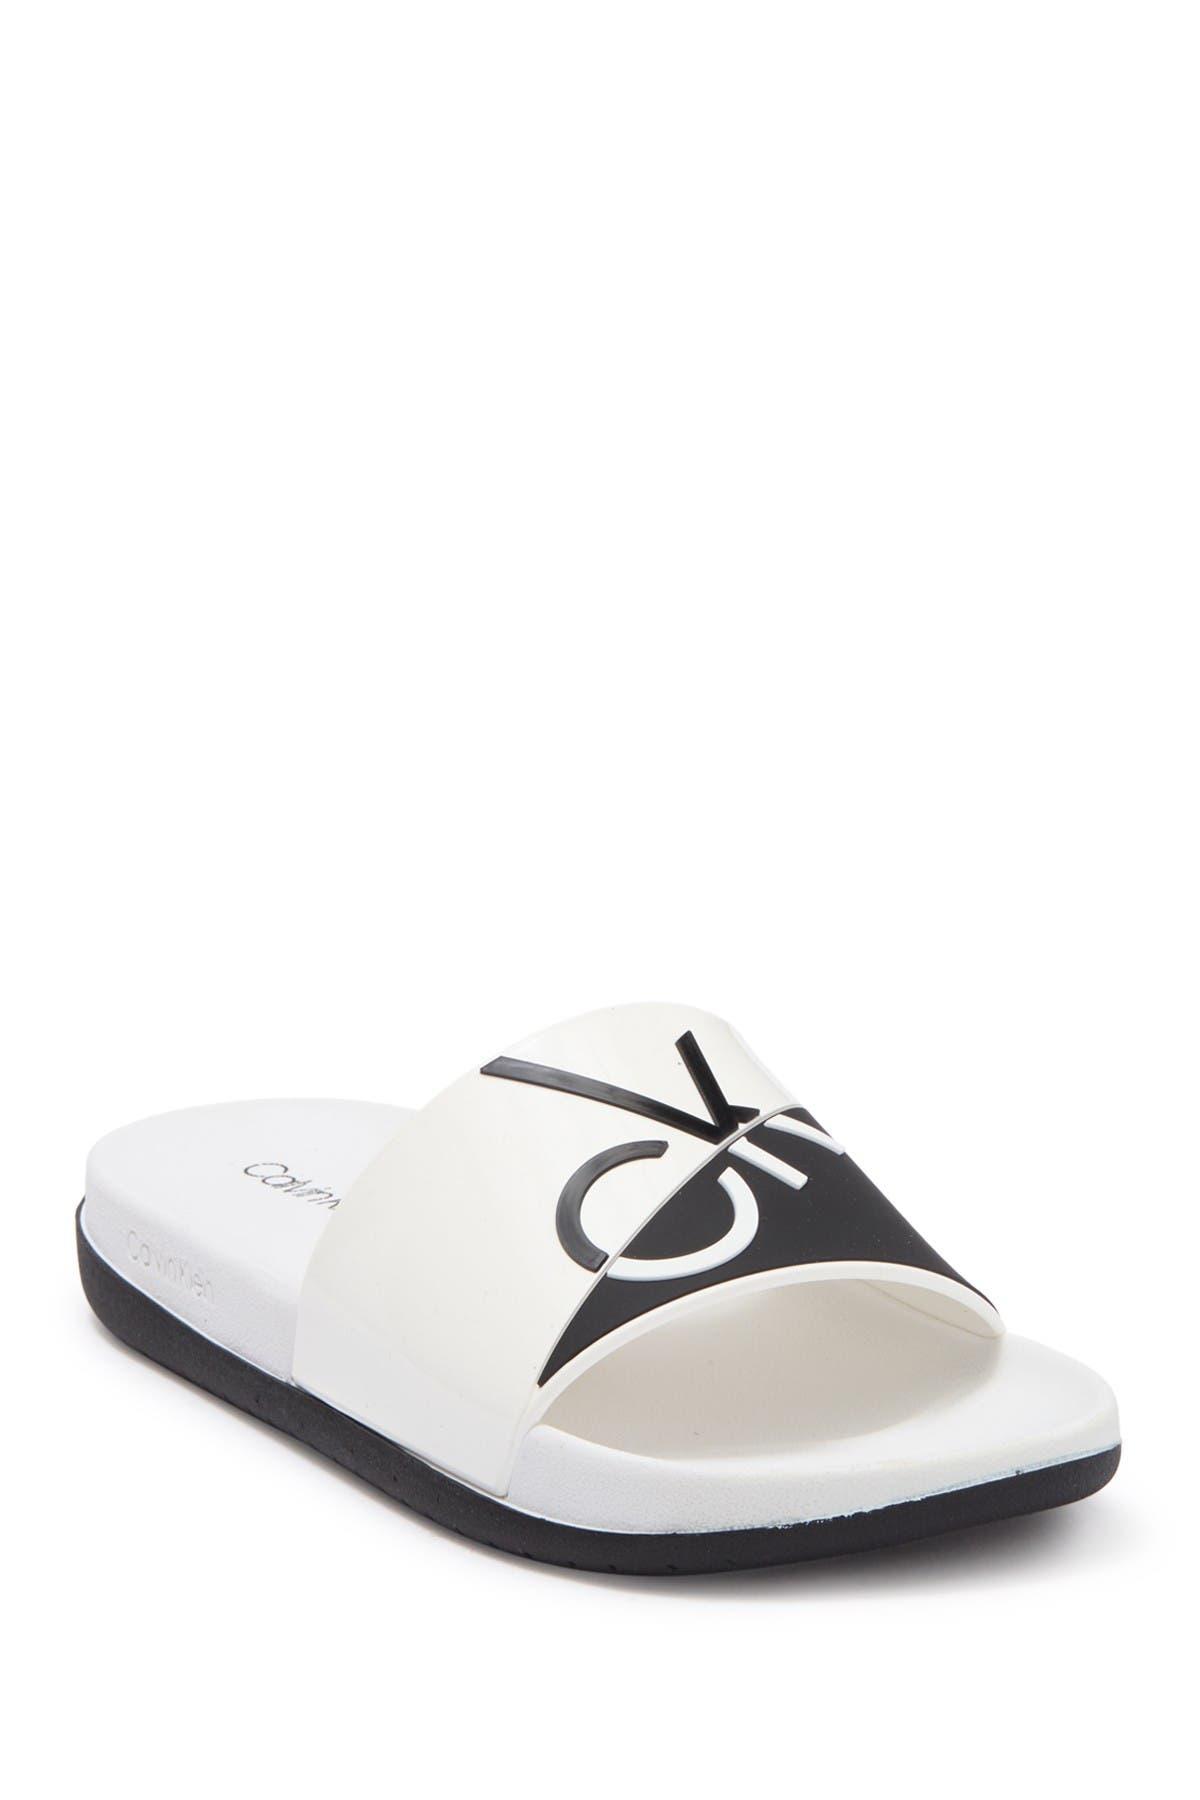 Image of Calvin Klein Brecken Slide Sandal